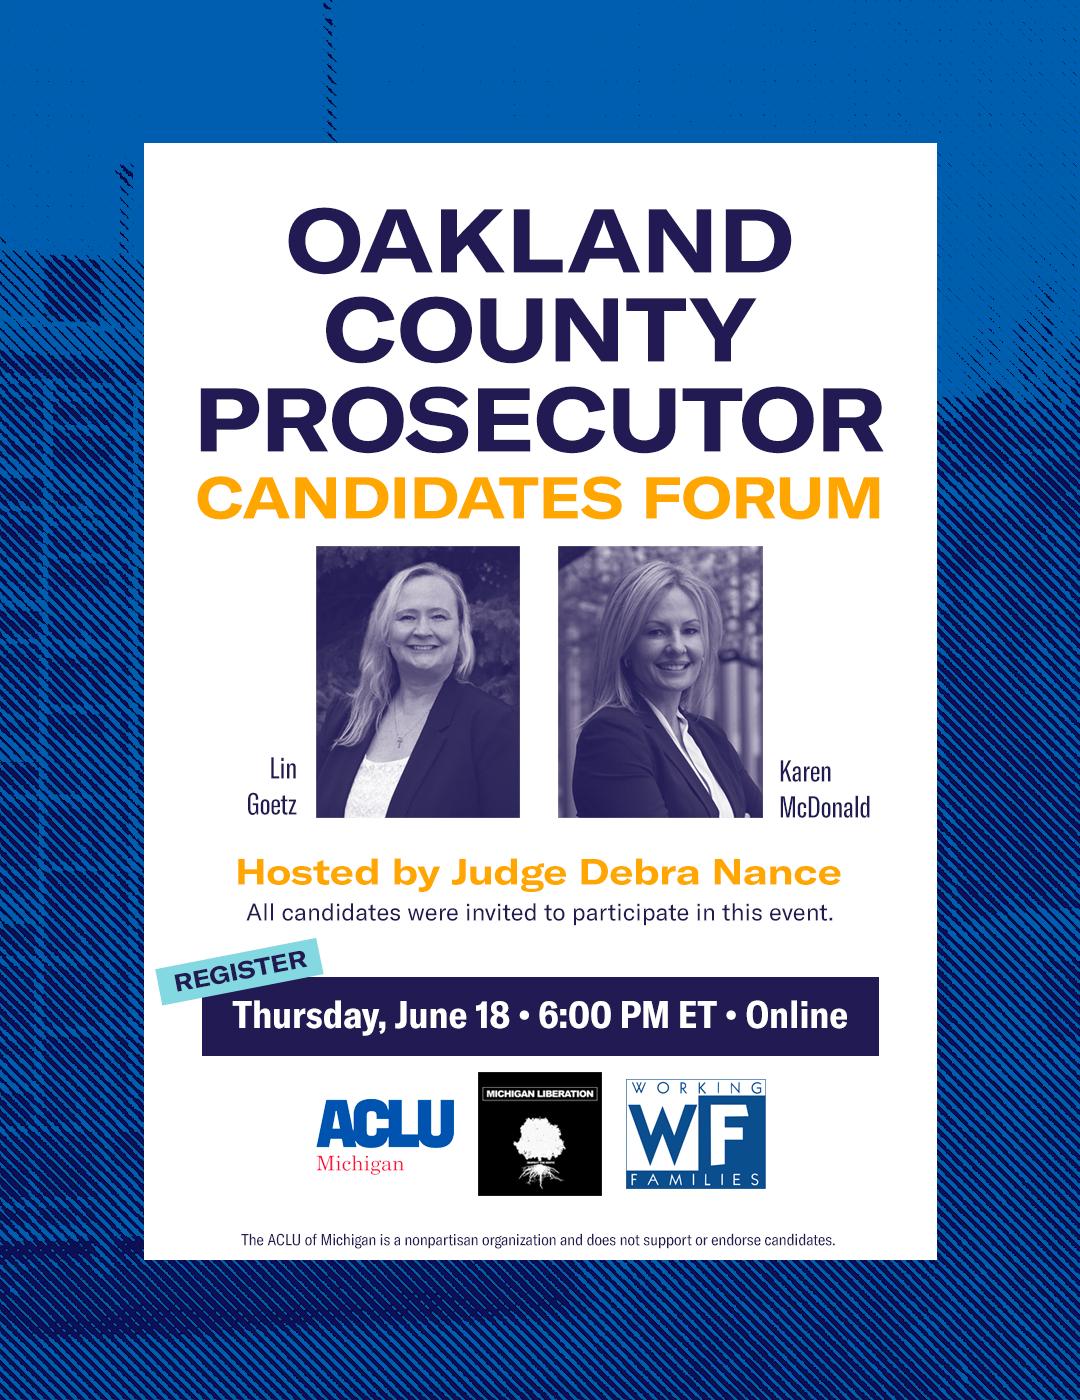 Oakland County Prosecutor Candidates Forum